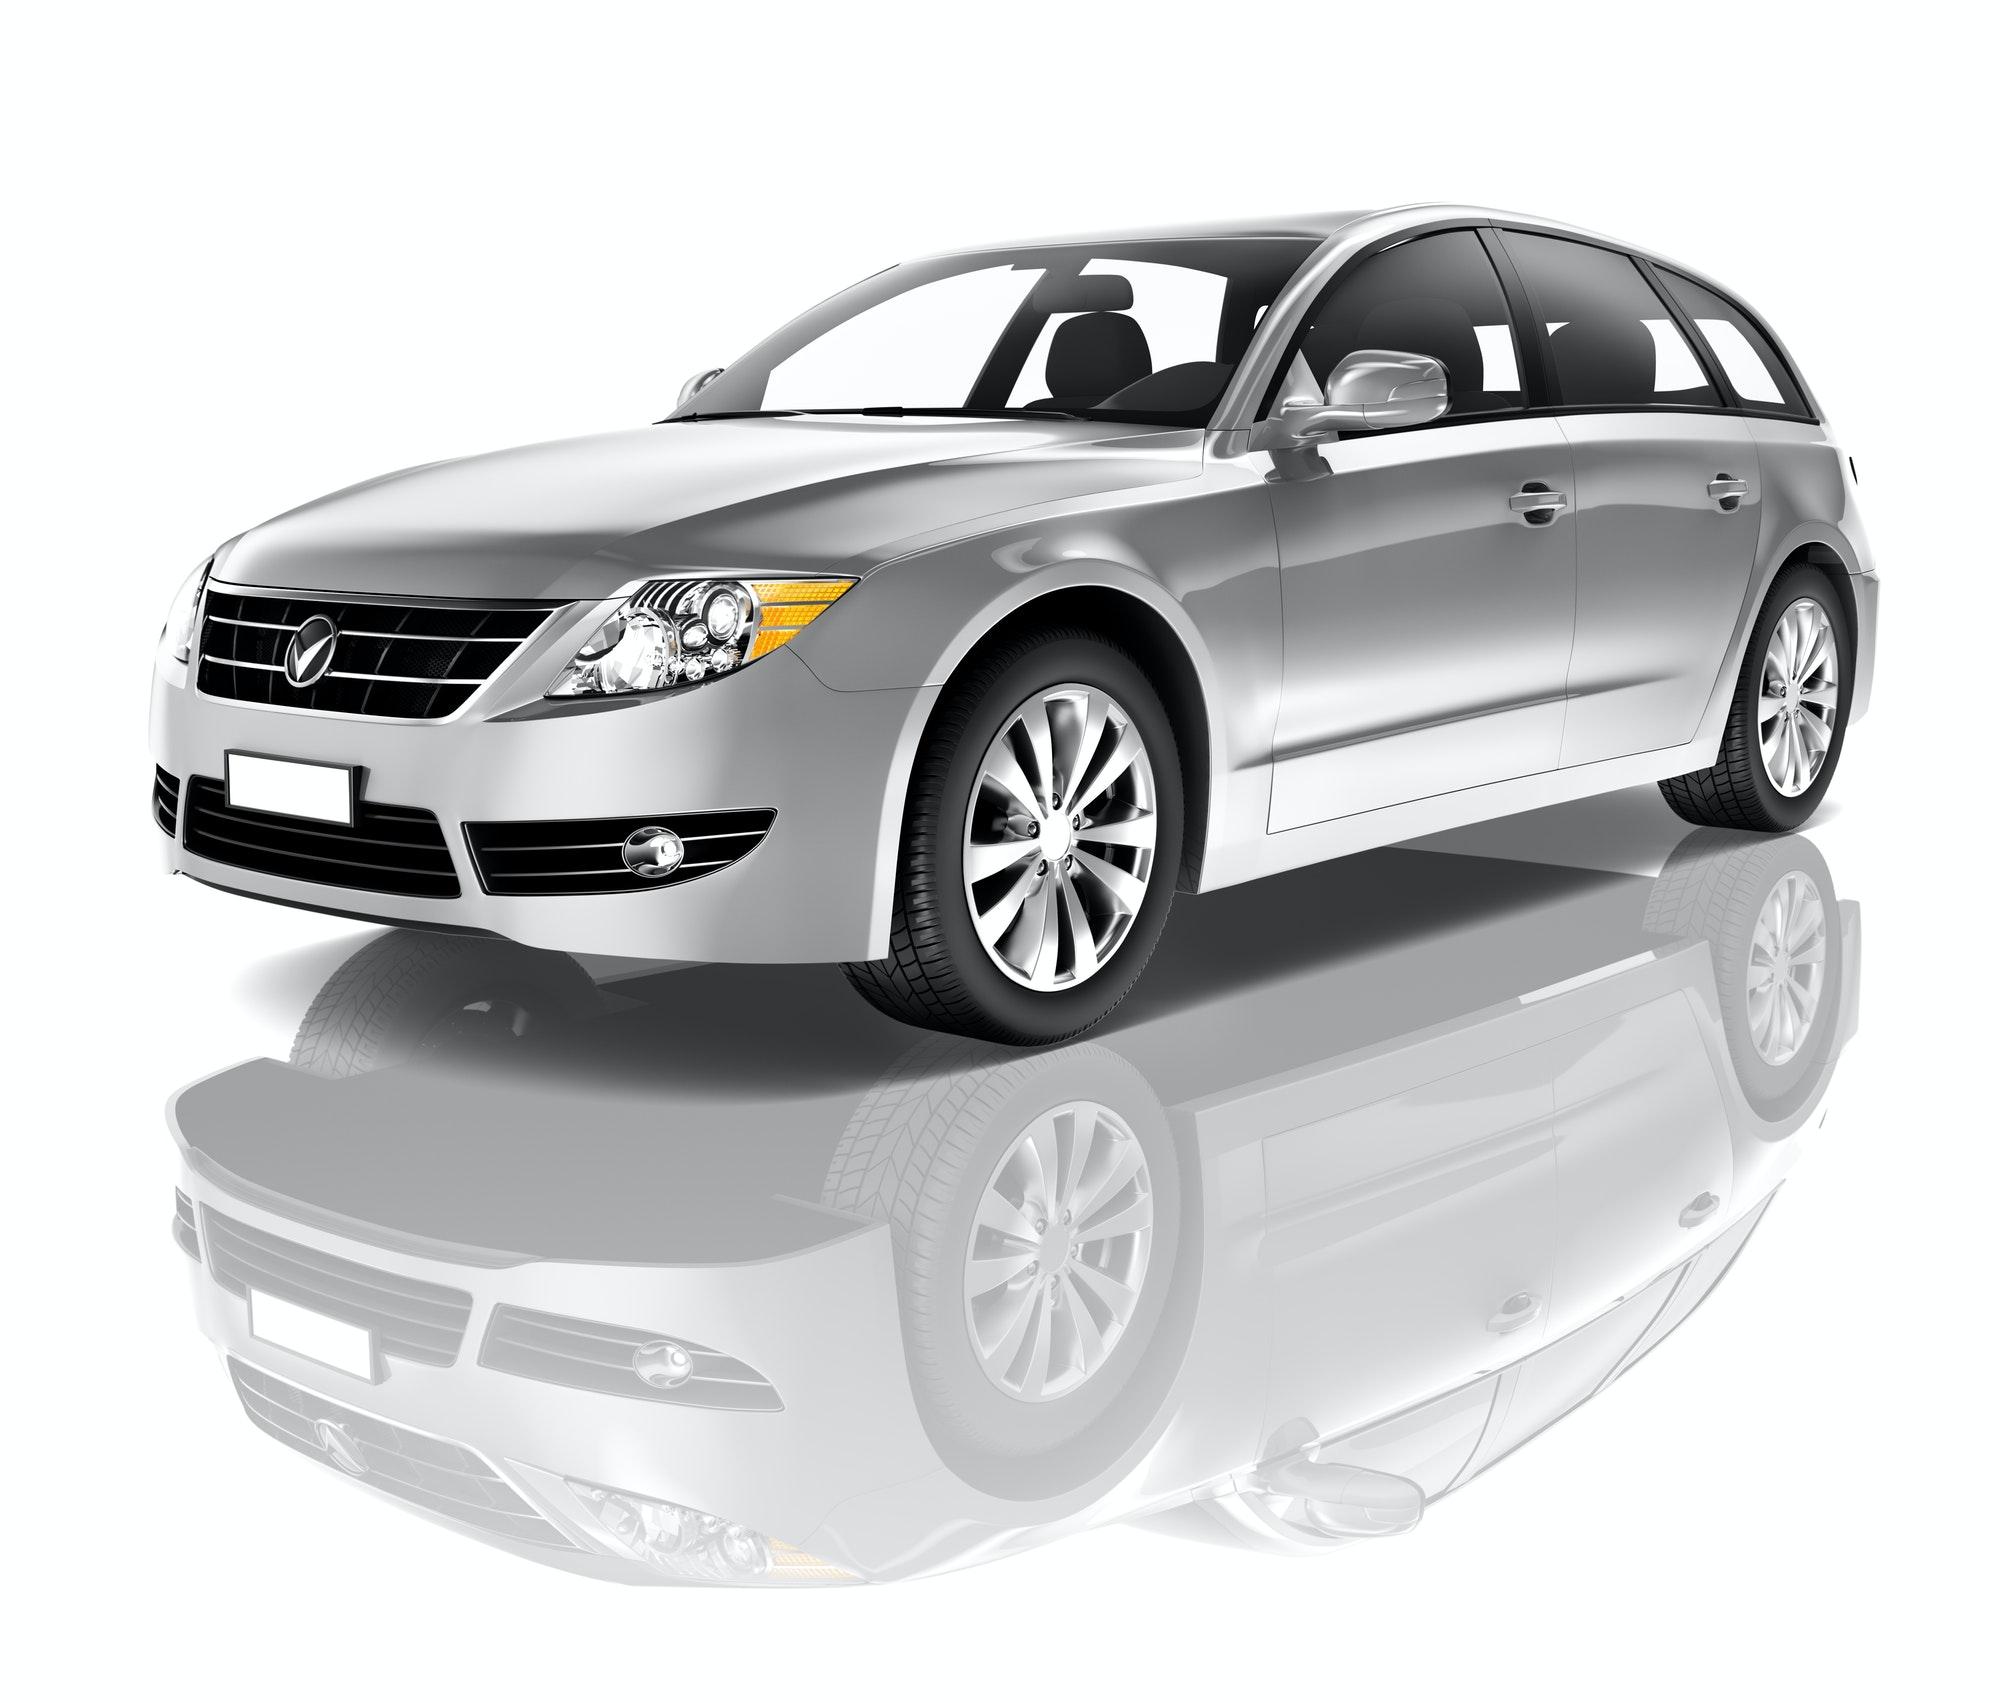 silver-car.jpg